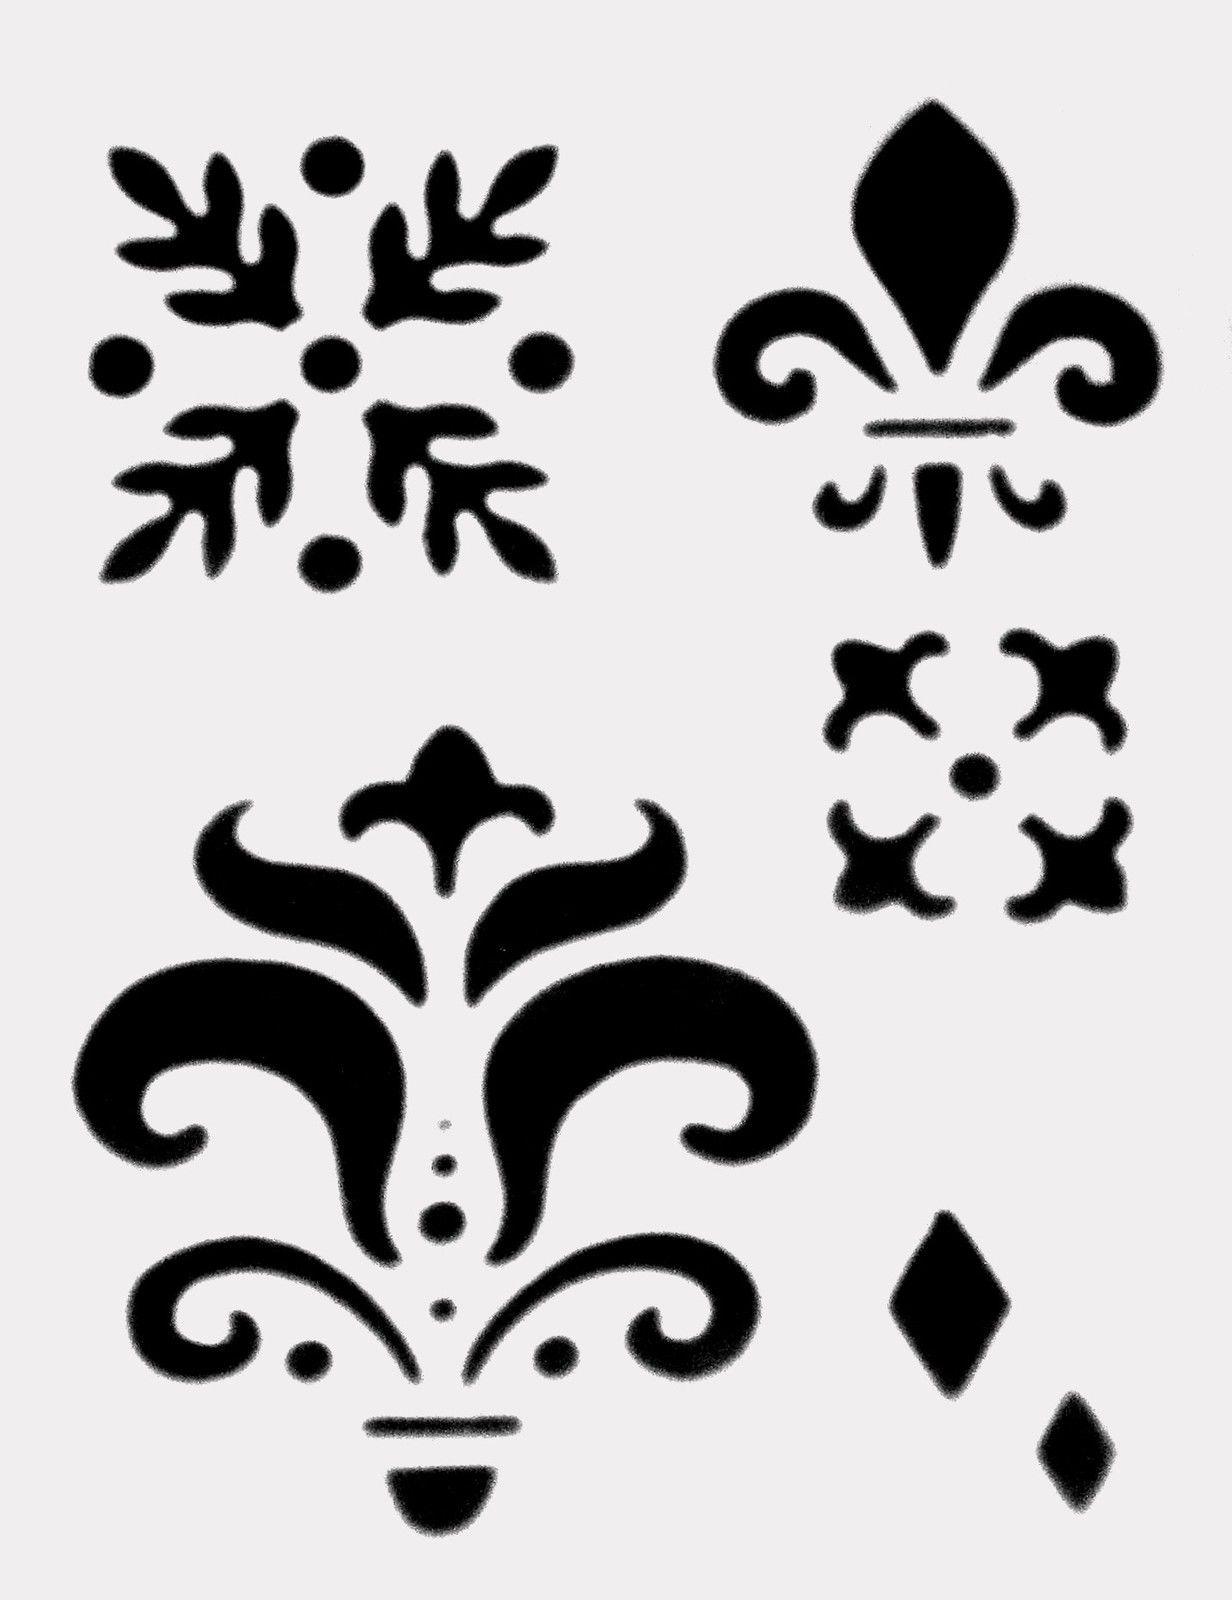 Fleur De Lis Stencil Pattern Group With 81+ Items - Damask Stencil Printable Free